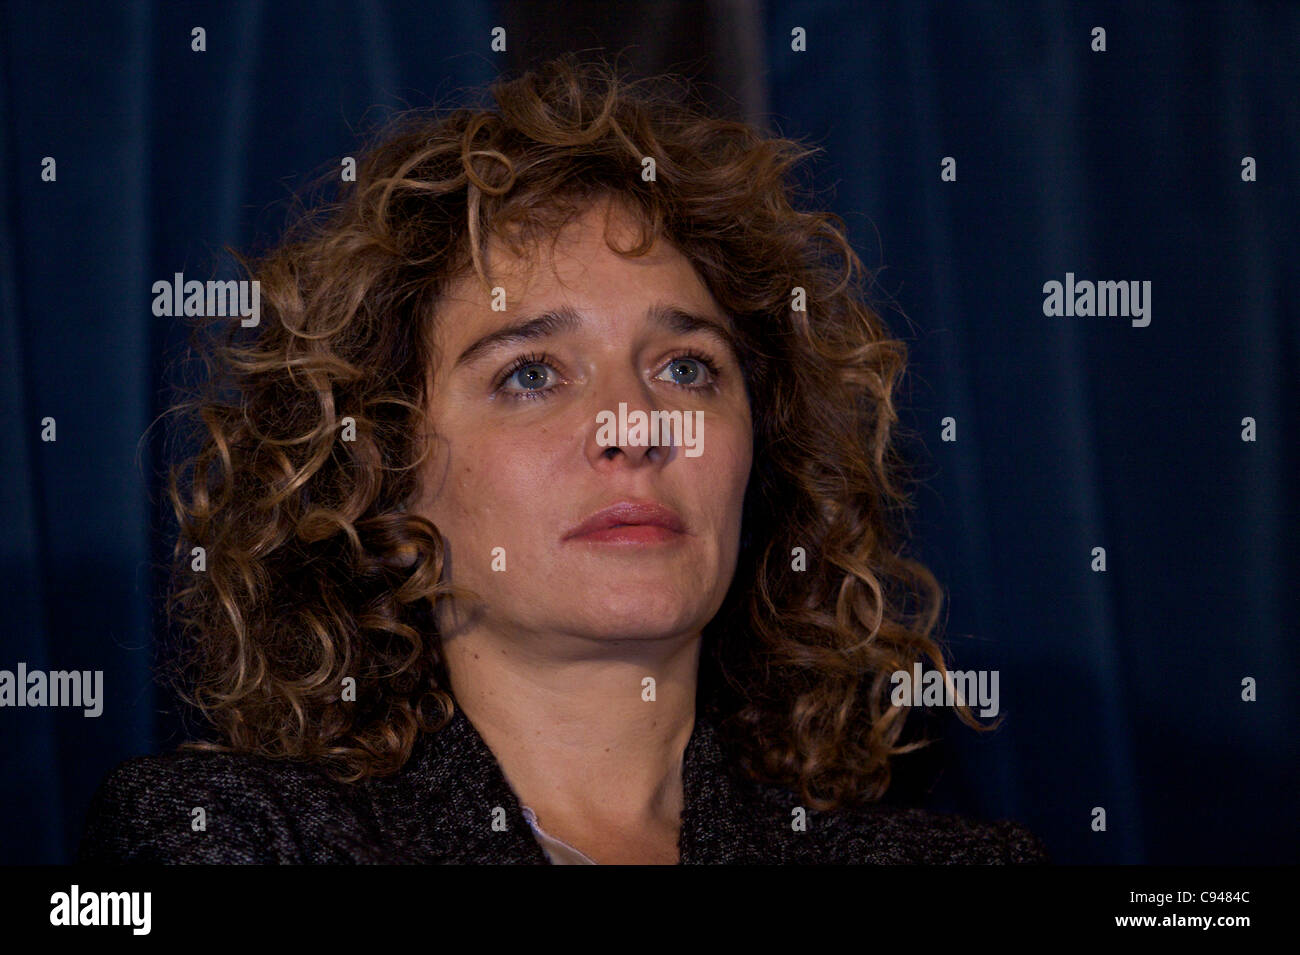 BOLOGNA, (IT) 11/Nov/2011: 'The Kryptonite inside the bag' Moview preview with Valeria Golino @ Cassero. - Stock Image